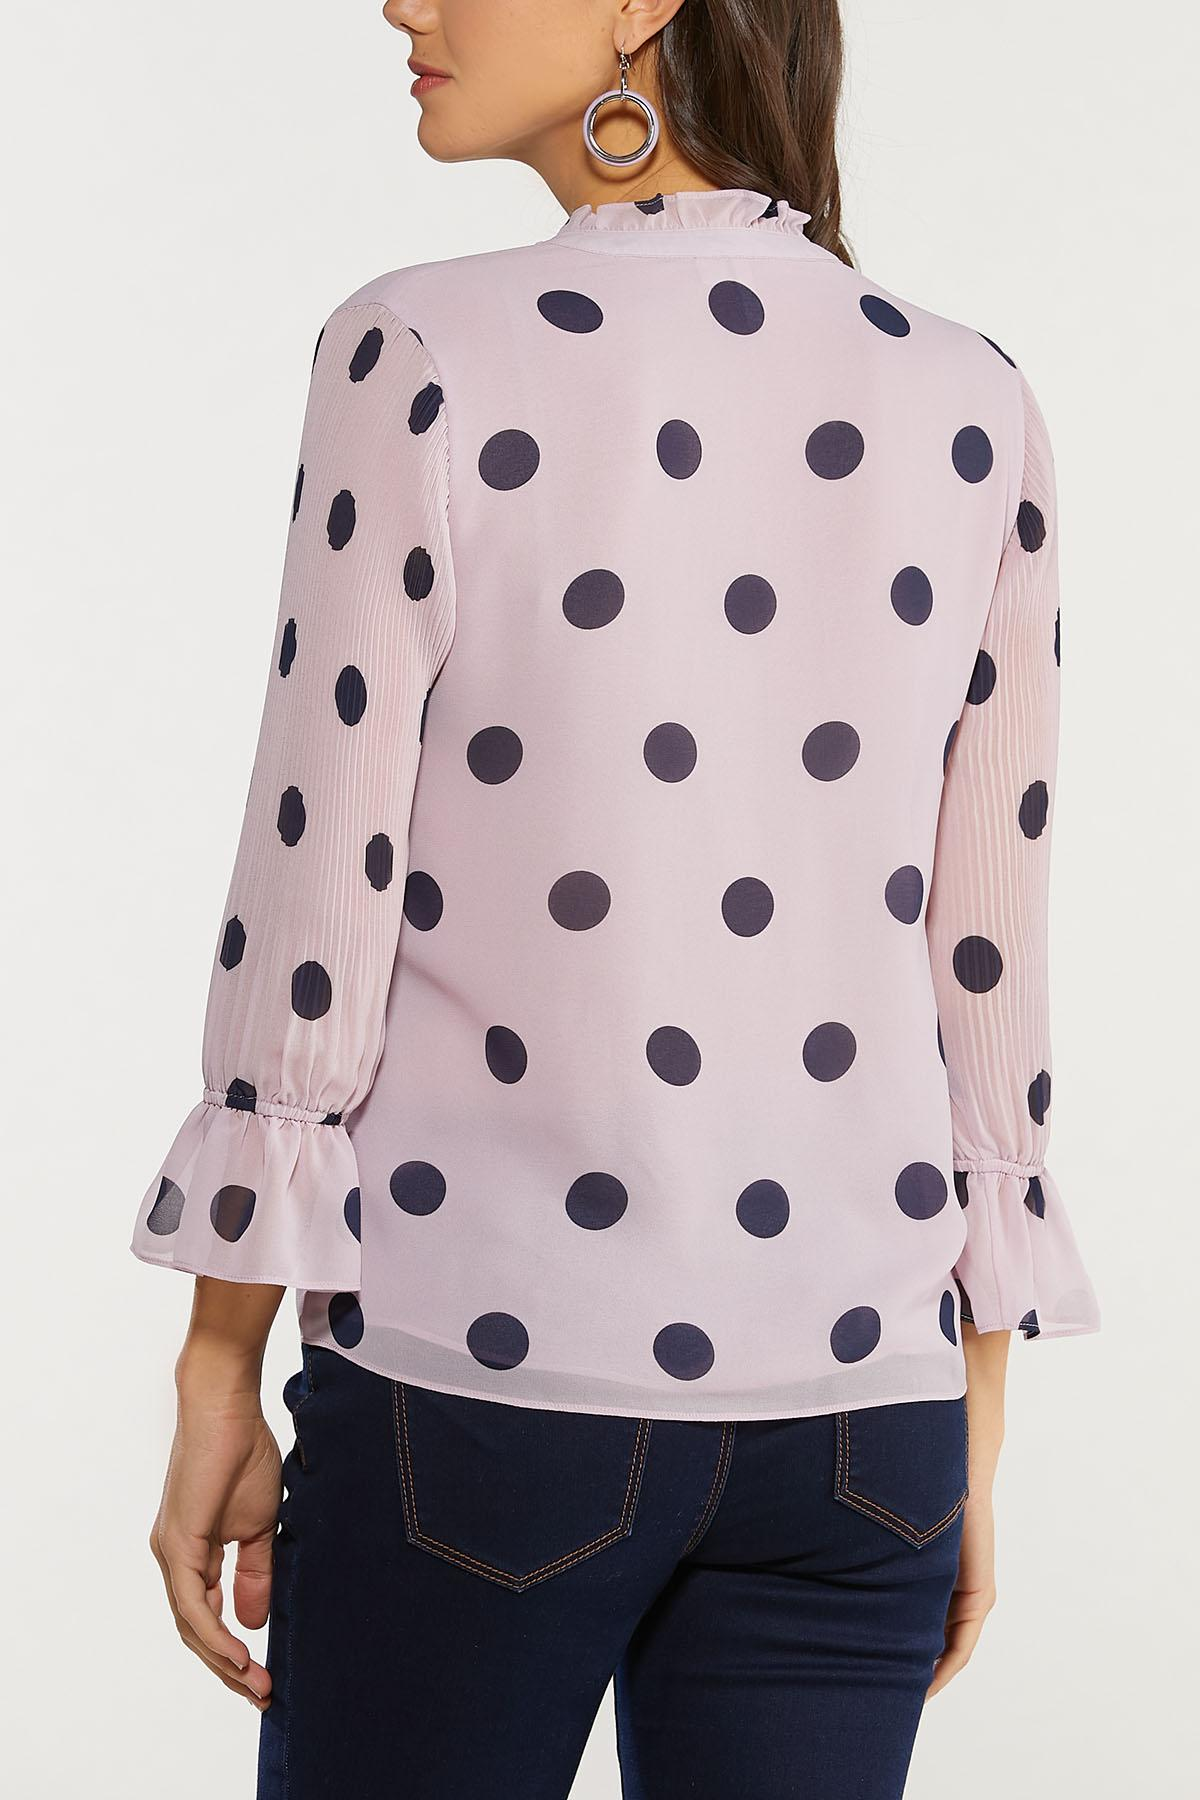 Plus Size Lavender Polka Dot Top (Item #44512004)